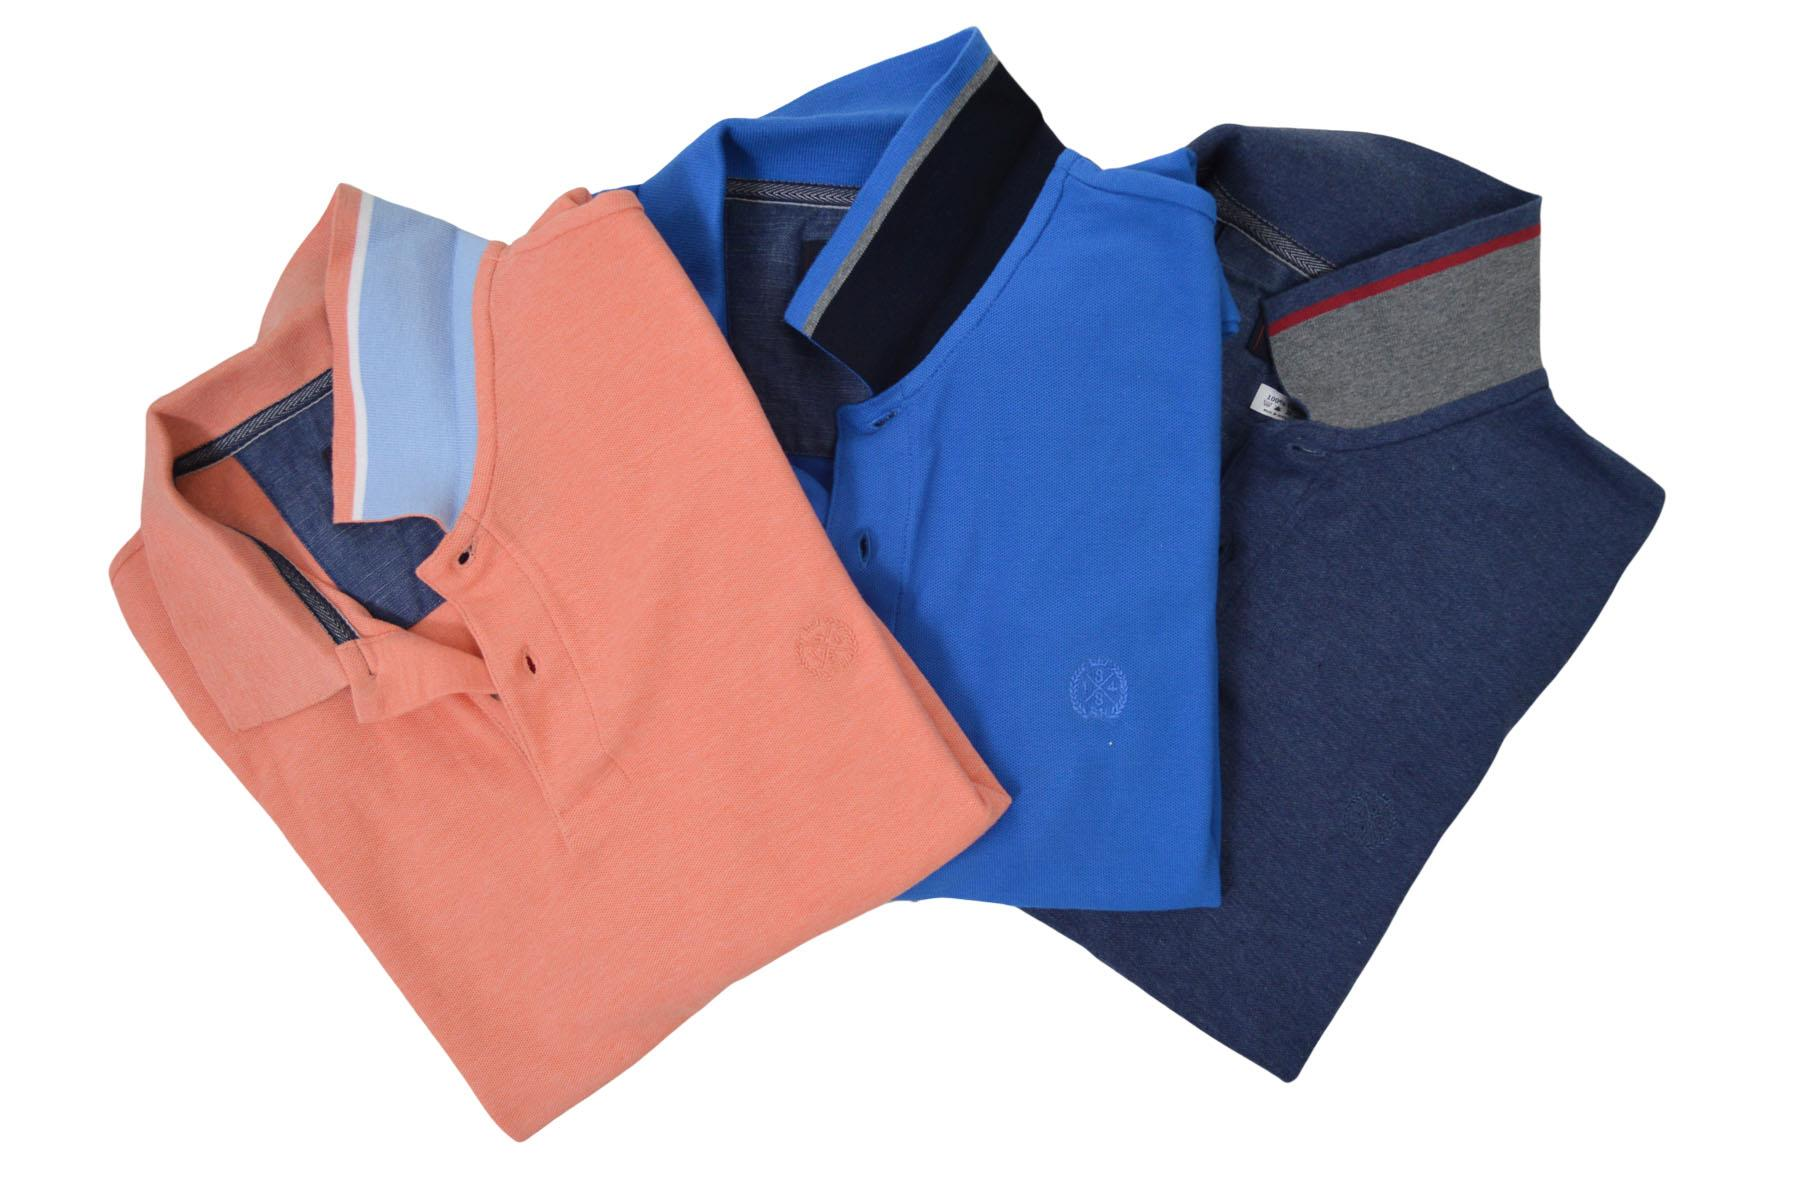 M-amp-S-BLUE-HARBOUR-Camisa-Polo-Para-Hombre-a-Rayas-Contraste-Cuello-Logotipo-Bordado miniatura 6